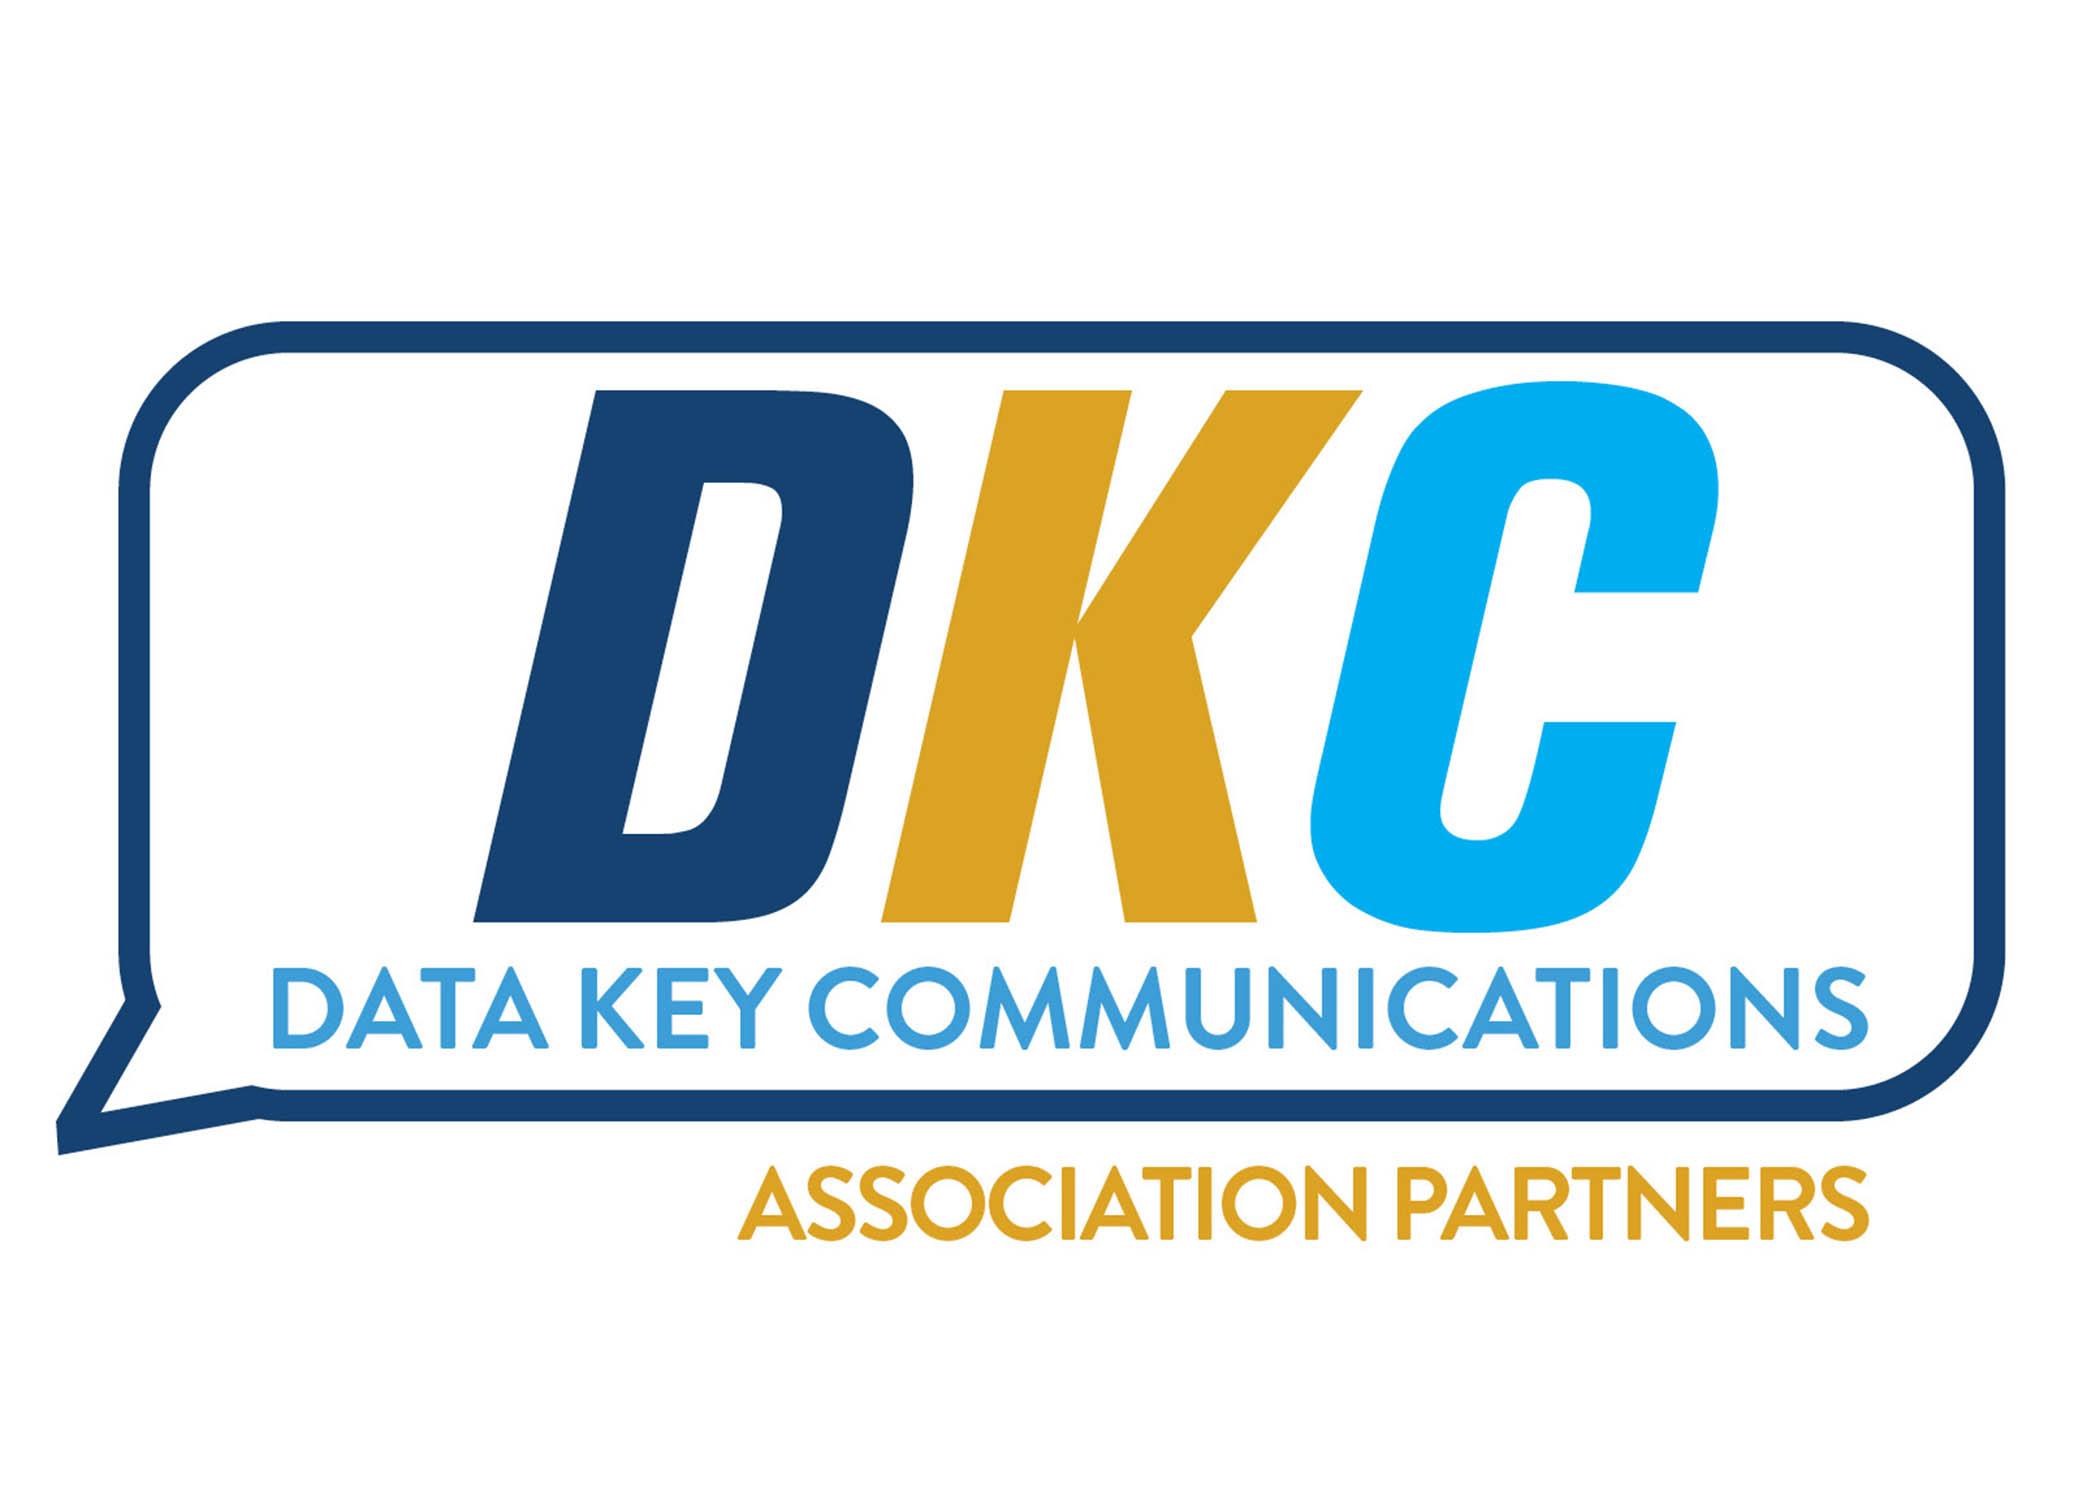 Data Key Communications